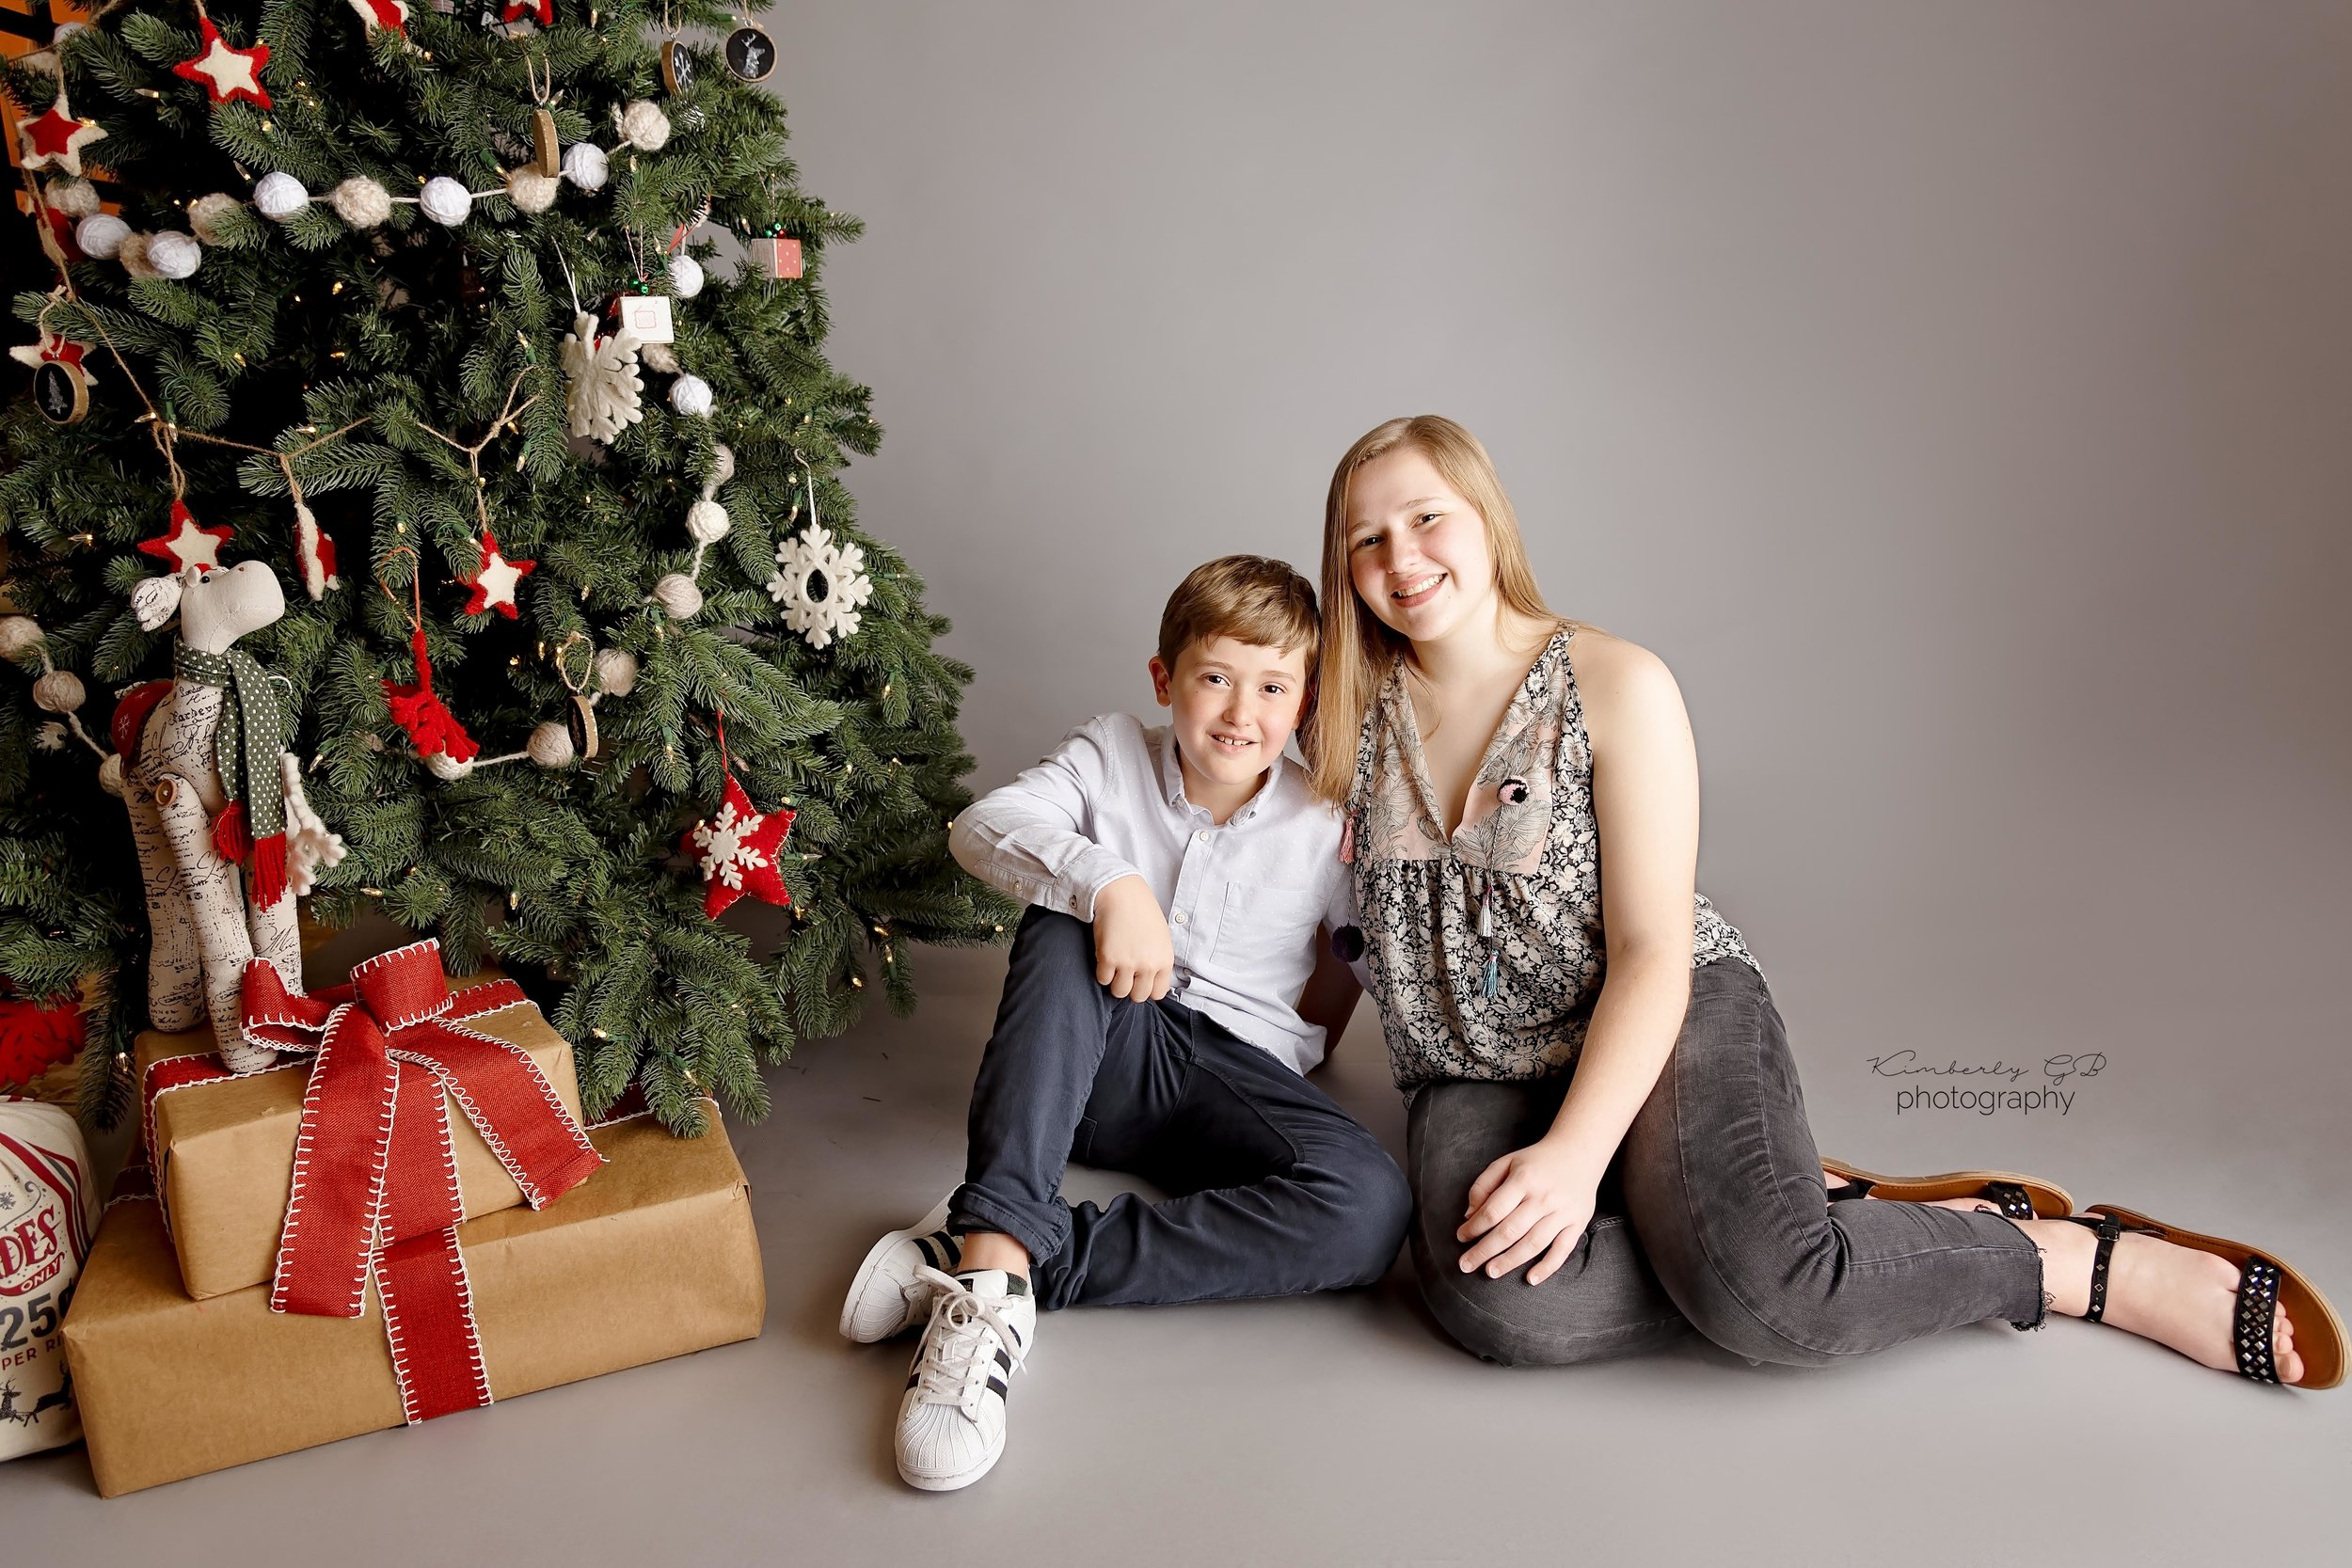 kimberly-gb-photography-fotografa-portrait-retrato-merry-little-christmas-sessions-12.jpg